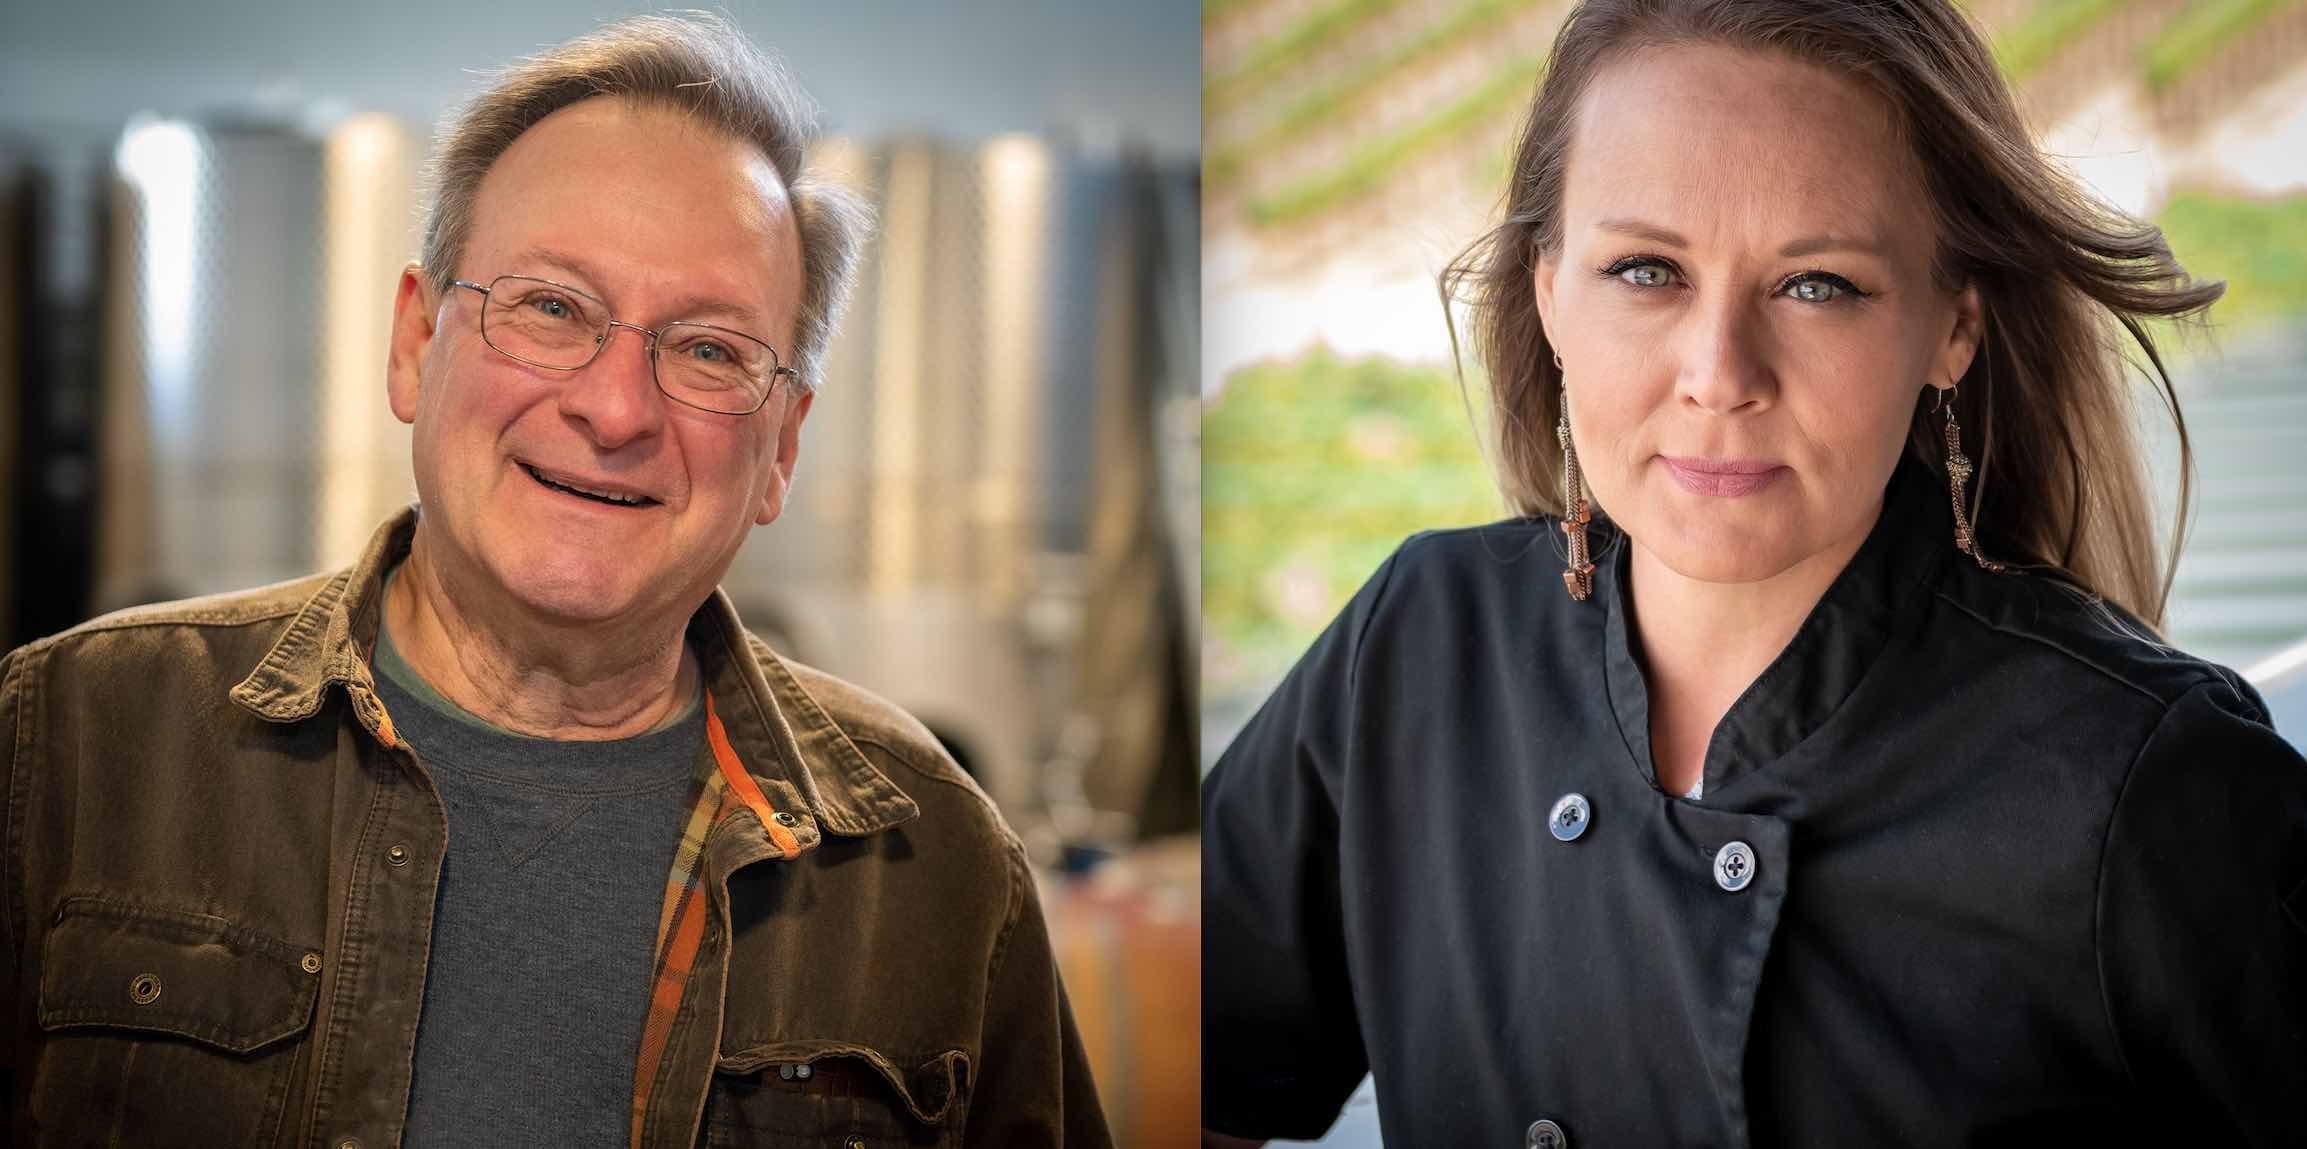 Bovino Vineyards celebrates one year anniversary, promotes staff members